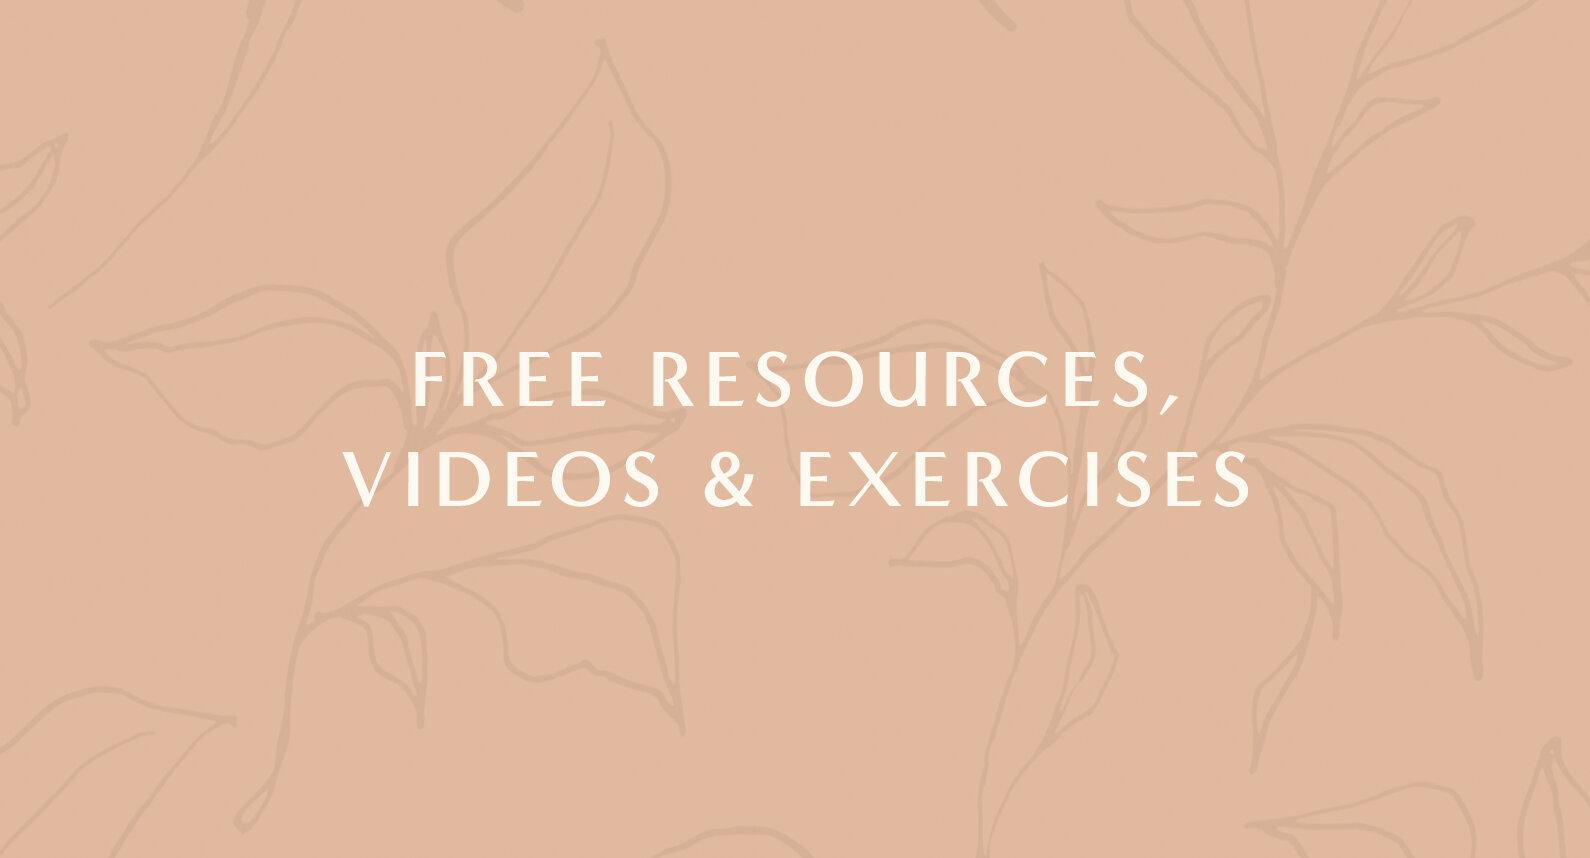 Free p videos